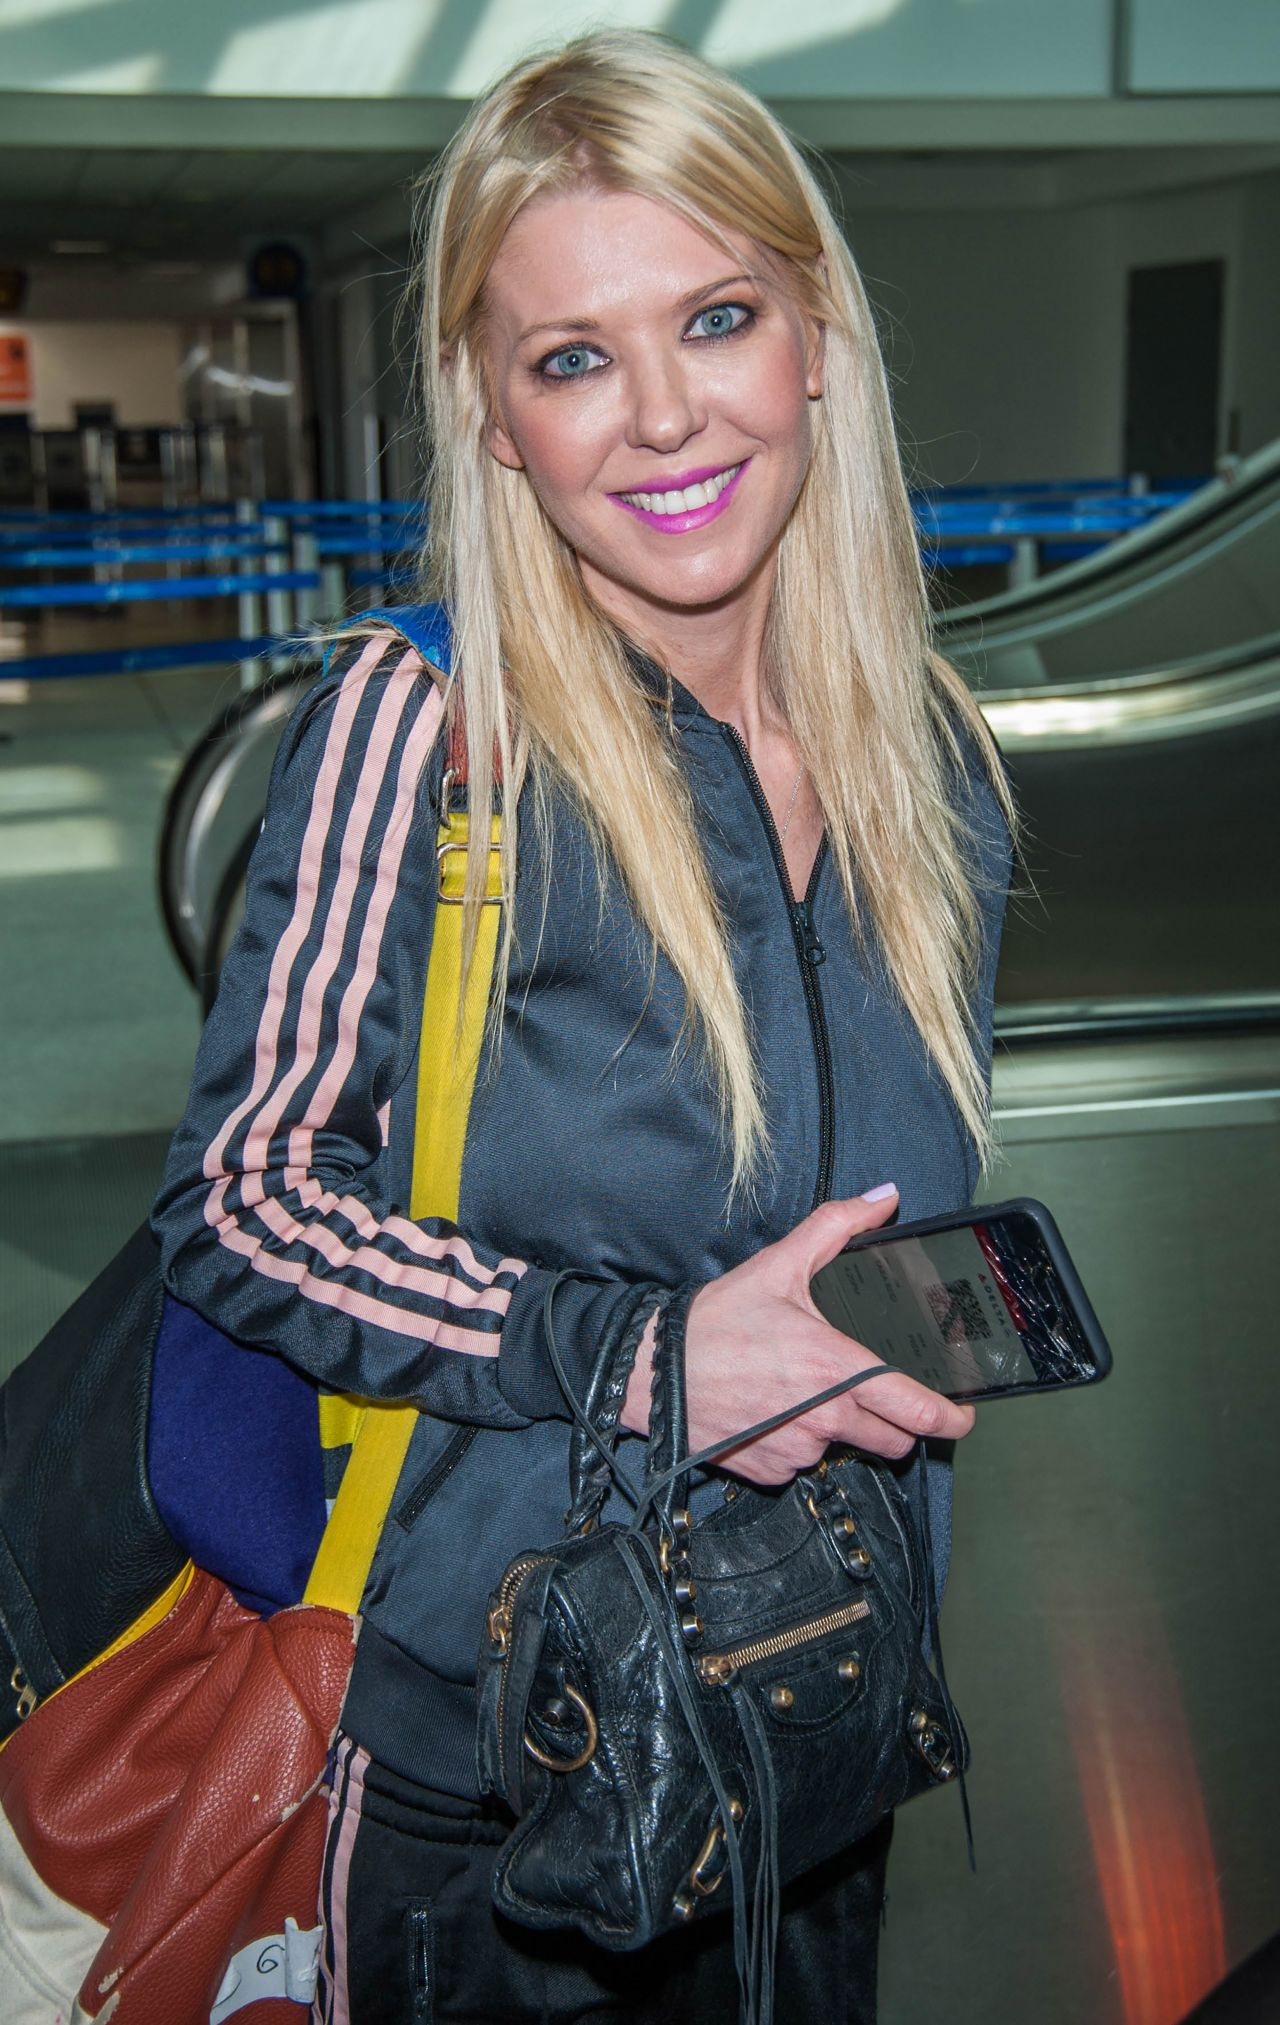 Tara Reid at LAX Airport in Los Angeles 3/19/ 2017